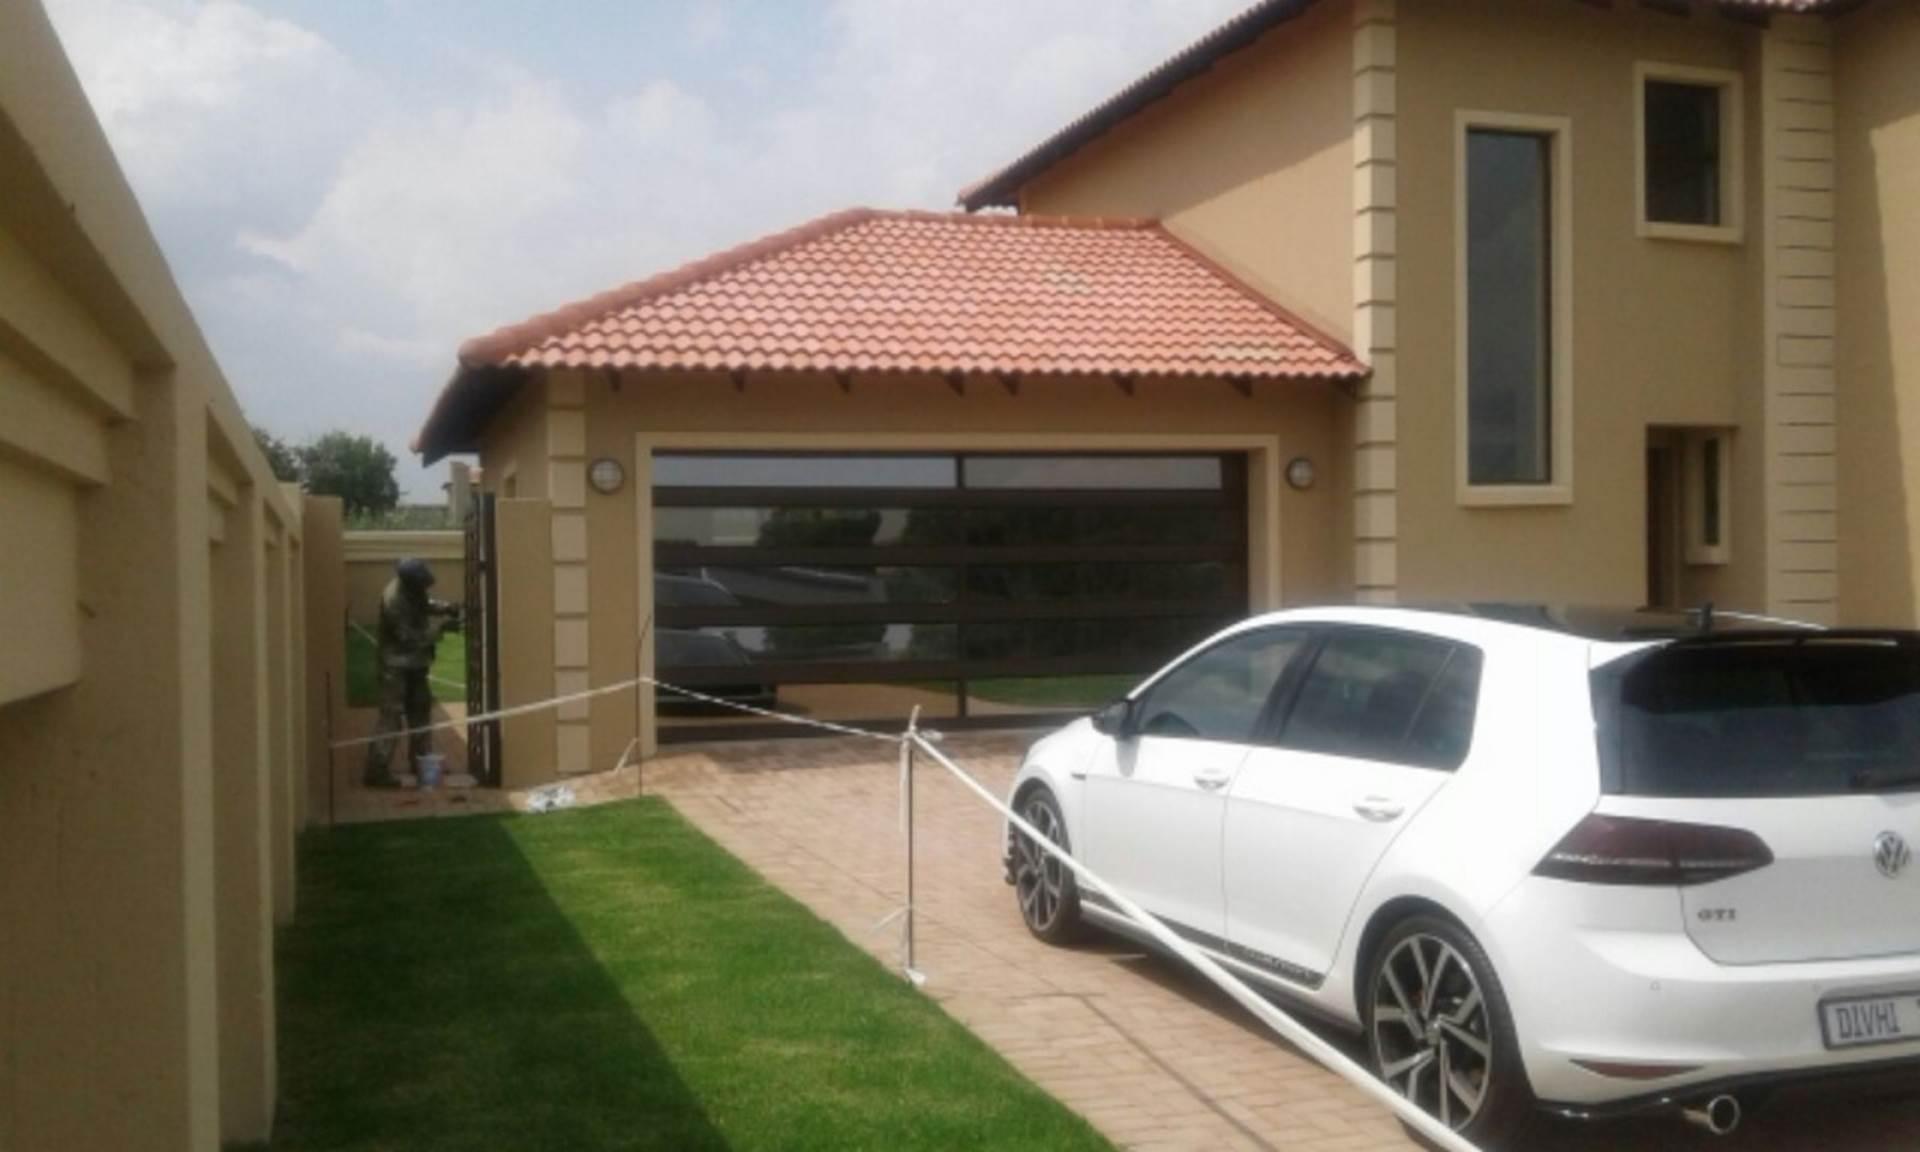 3 BedroomHouse For Sale In Helderwyk Estate